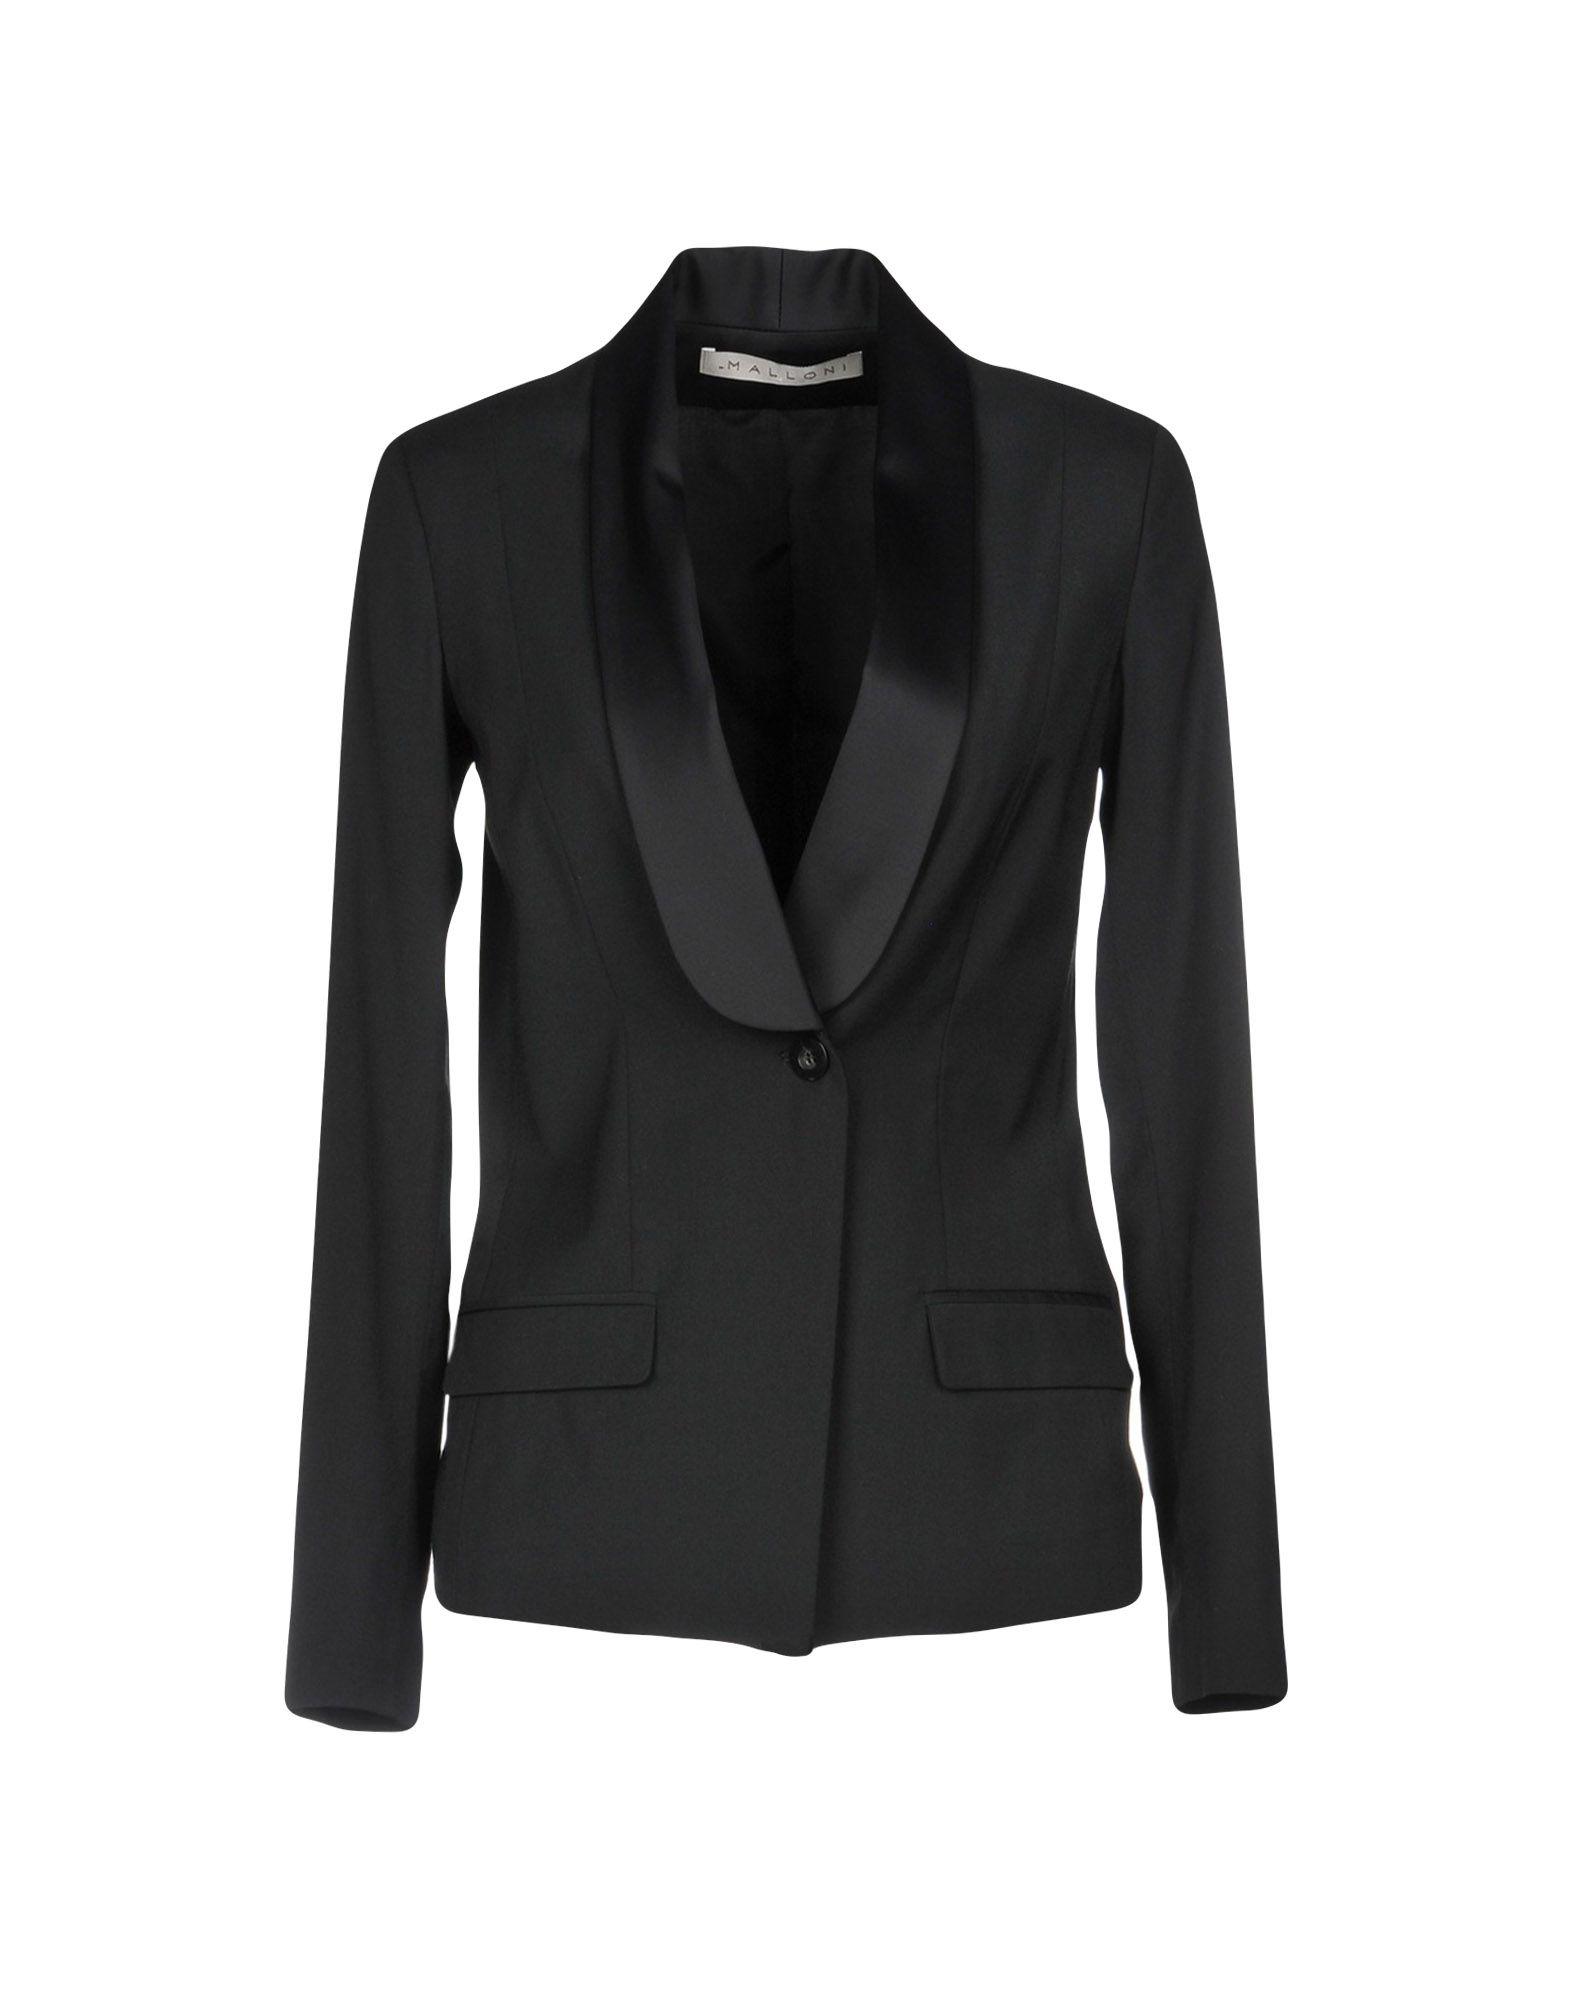 MALLONI Blazer in Black